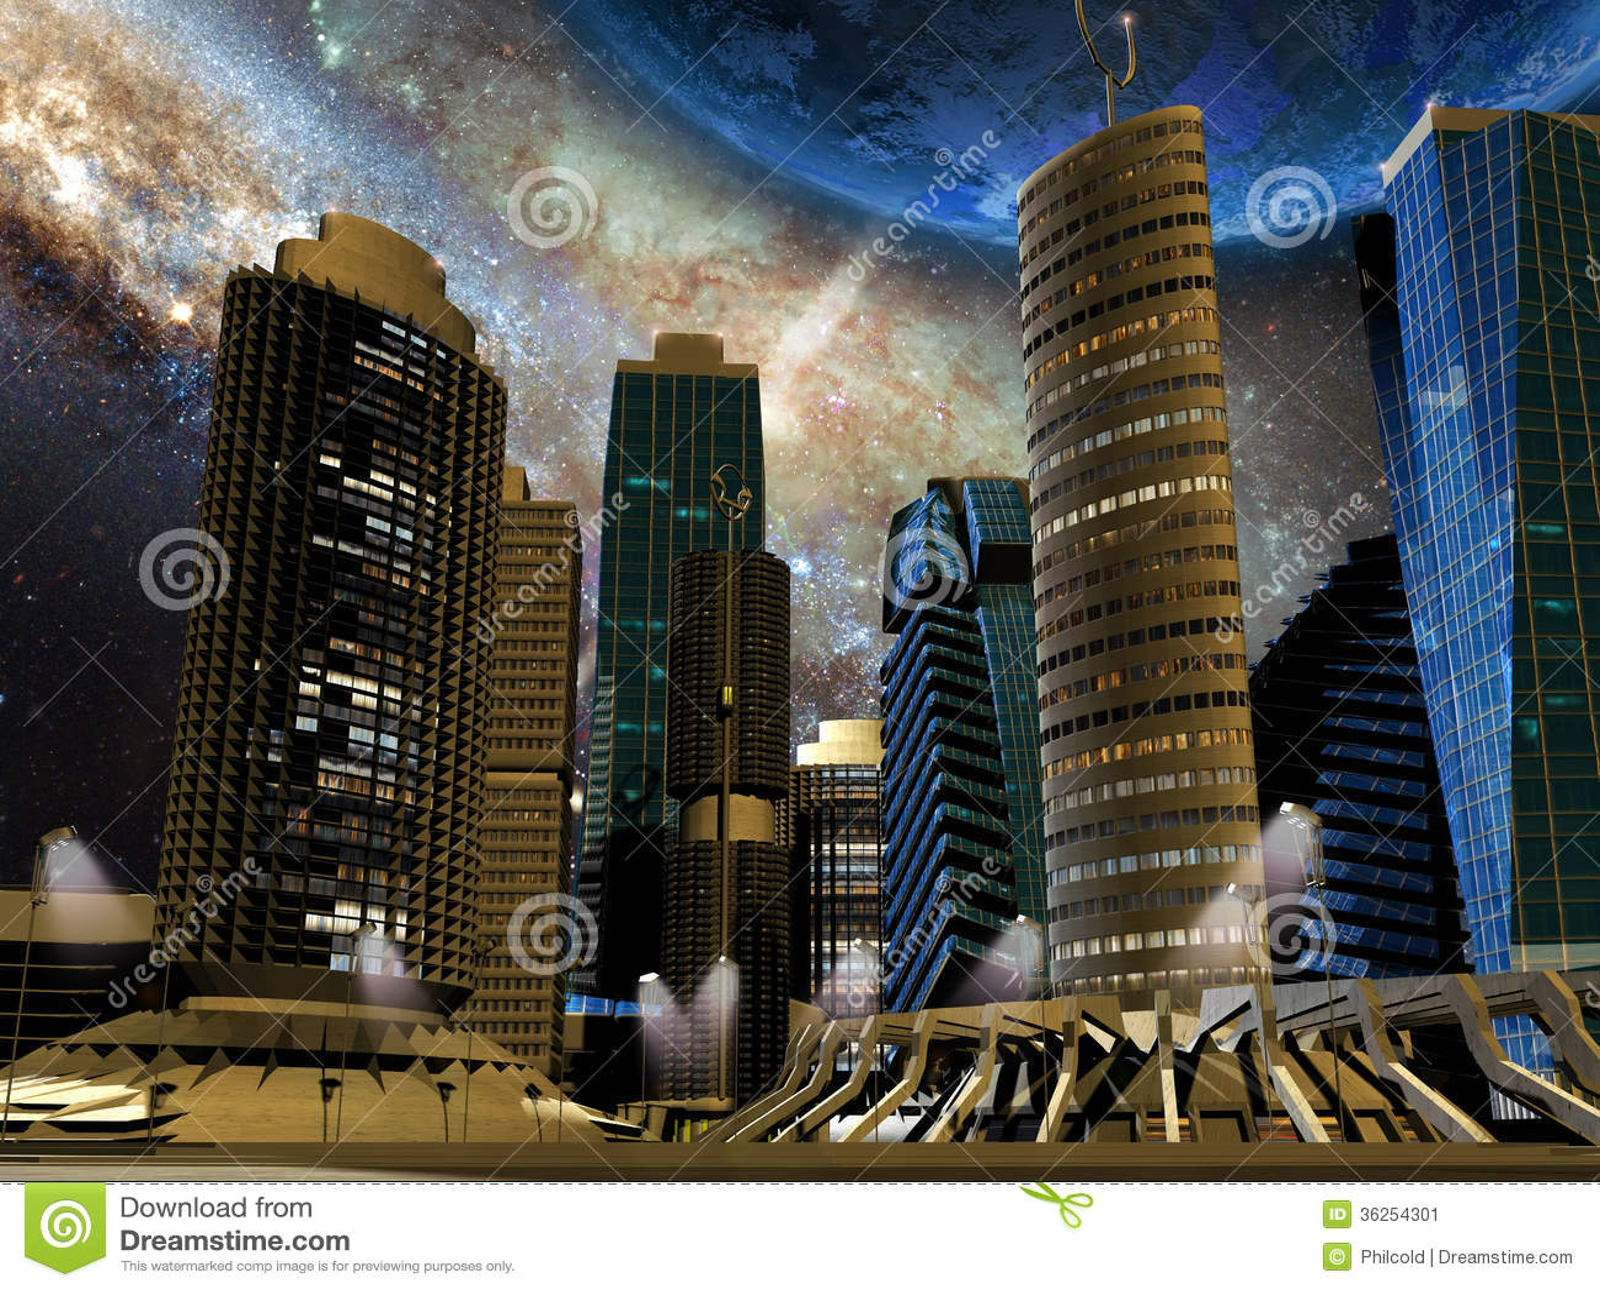 future city stock image